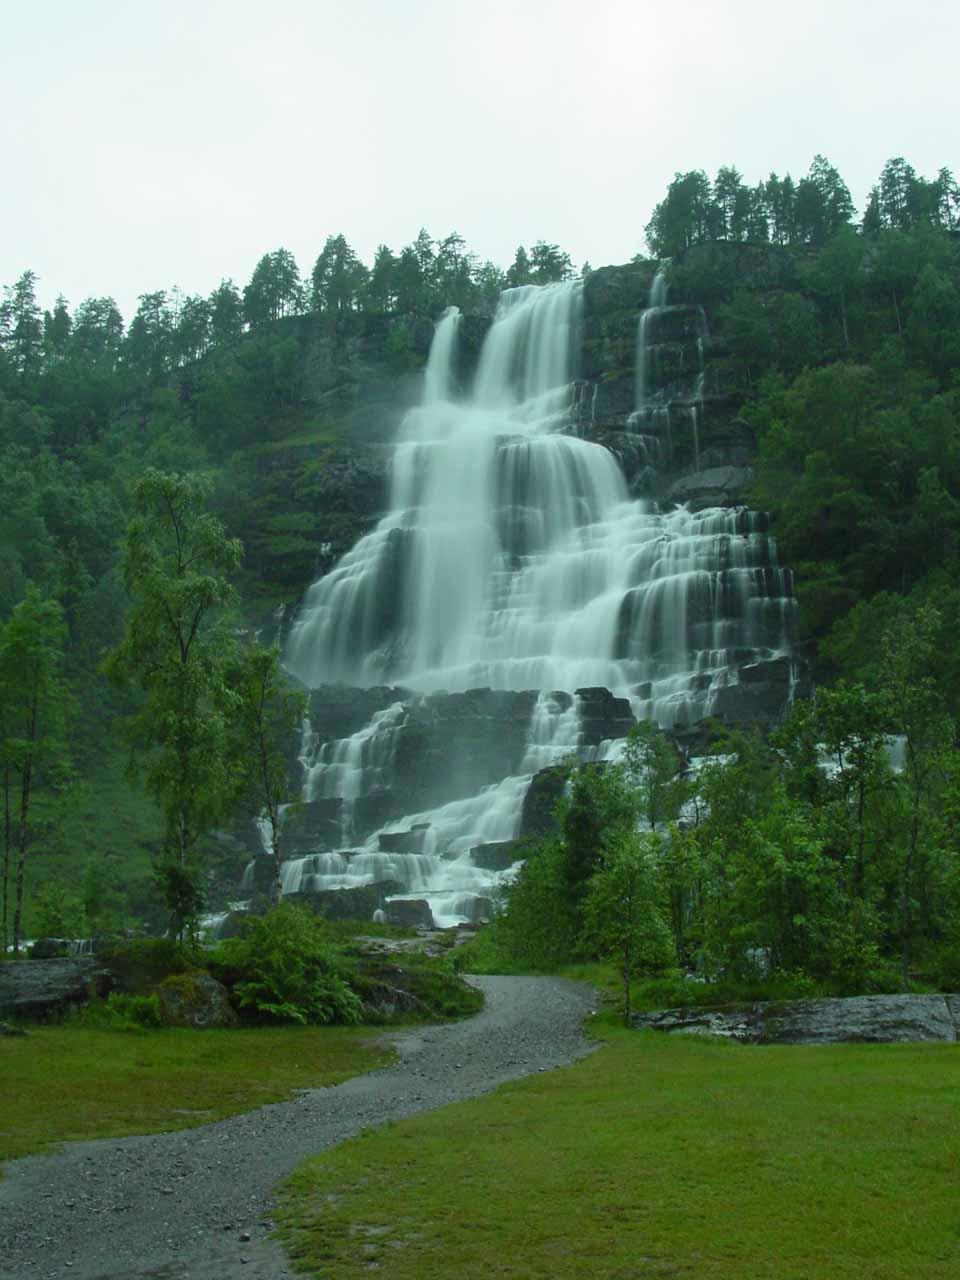 The delicate flow of Tvinnefossen